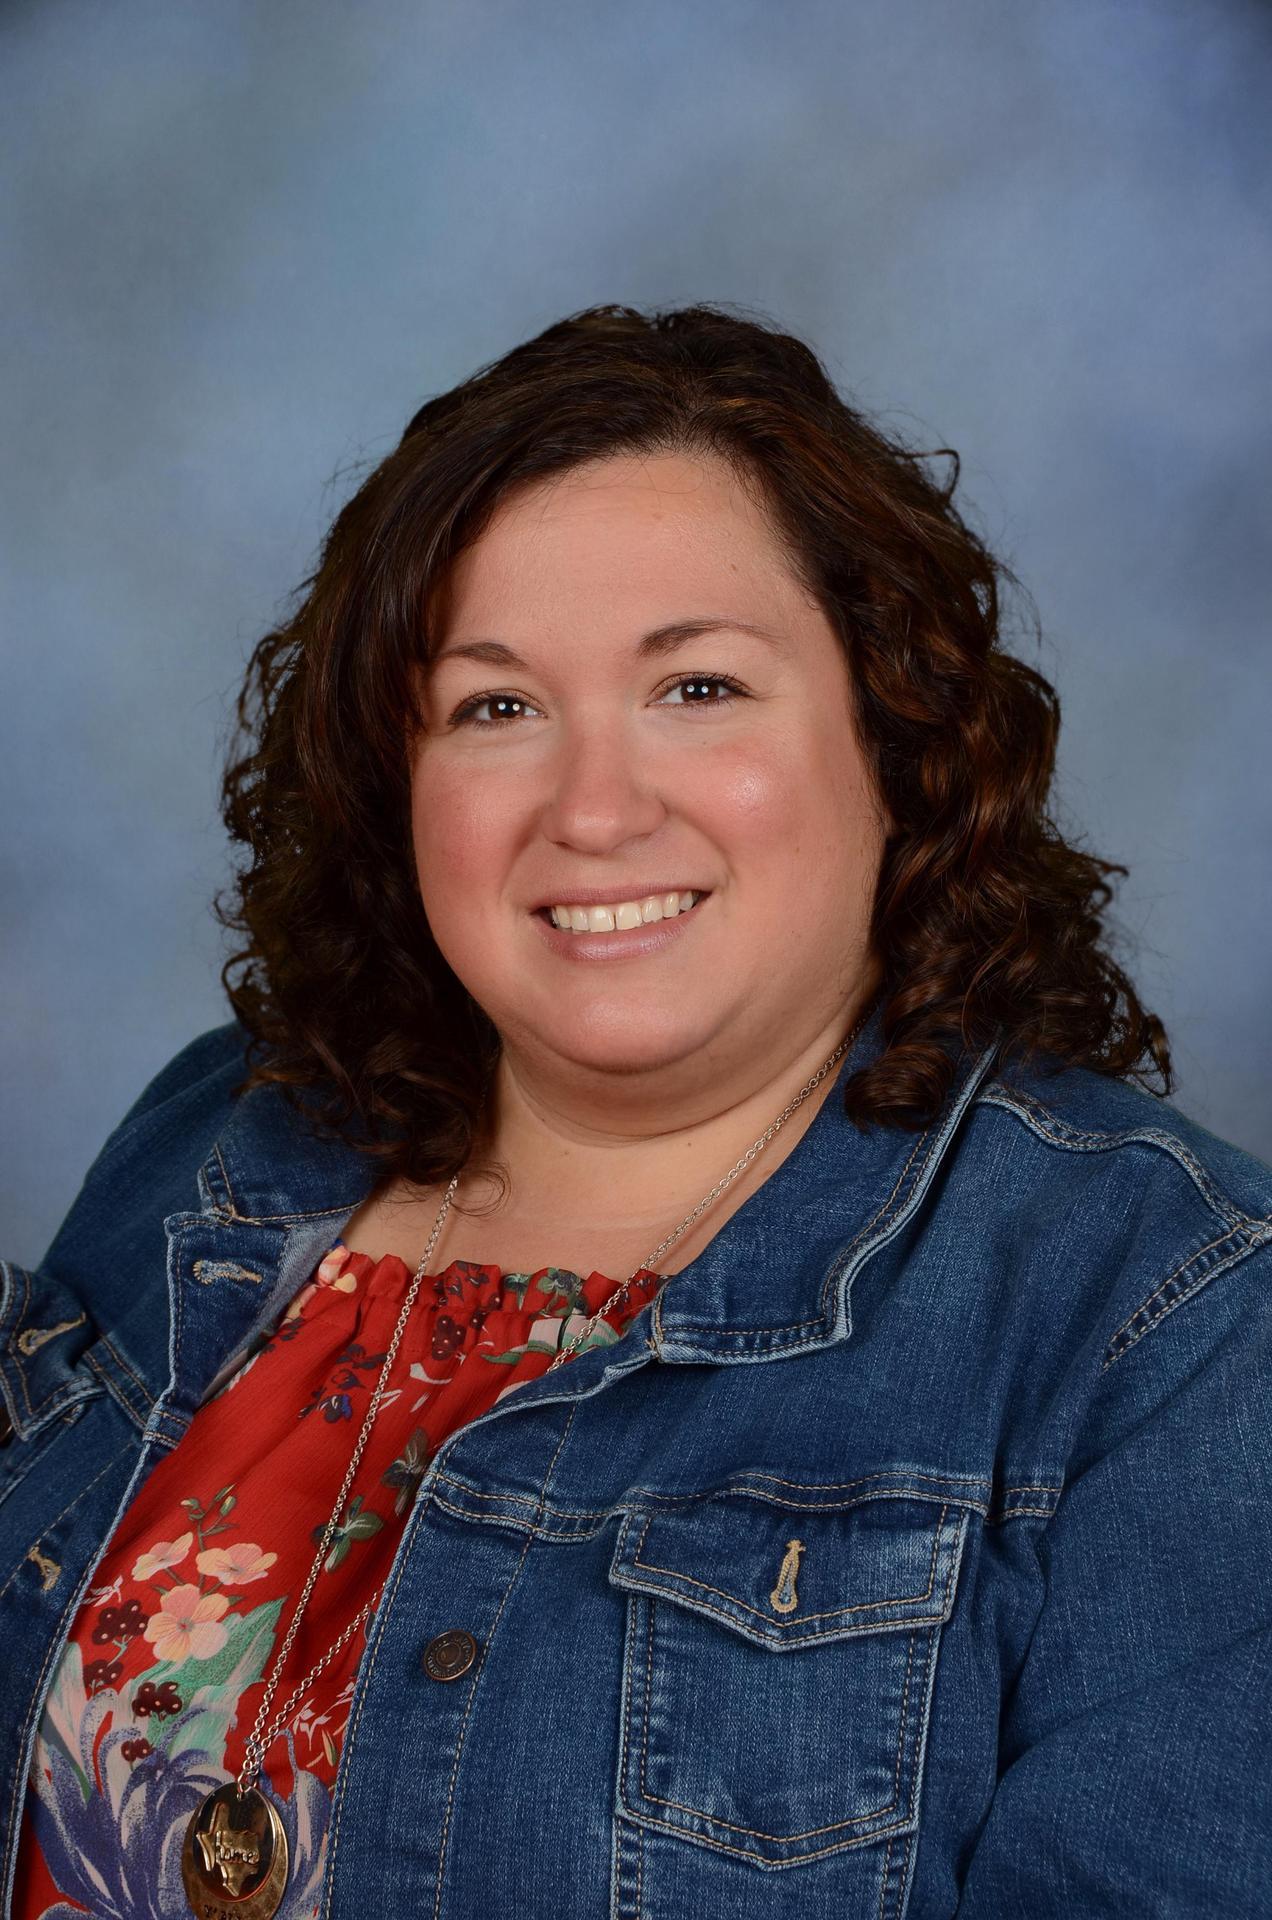 Kimberly Flanigan, Registrar